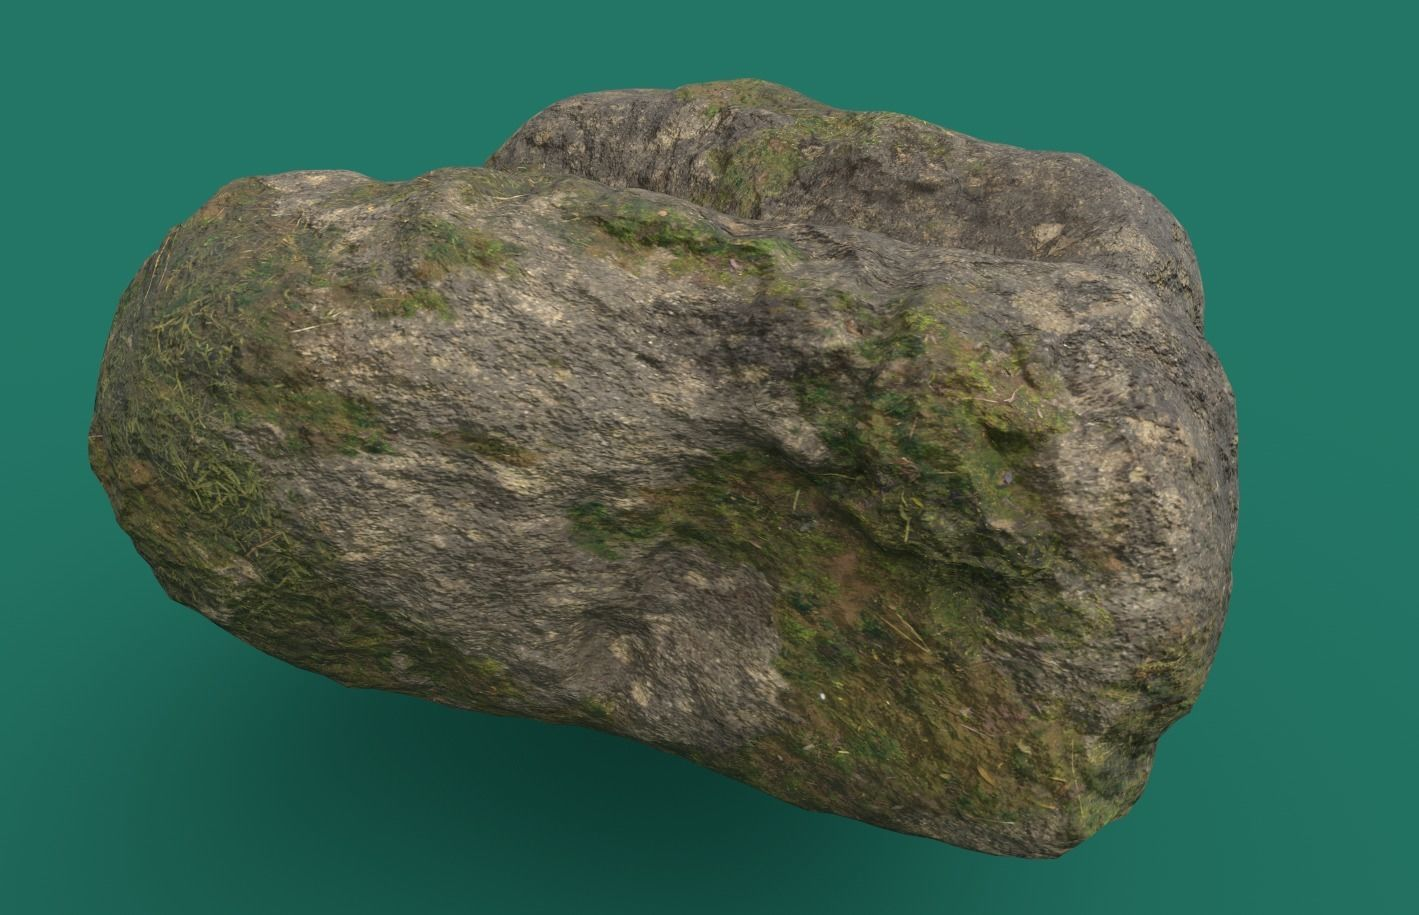 Mossy Rock 3 PBR